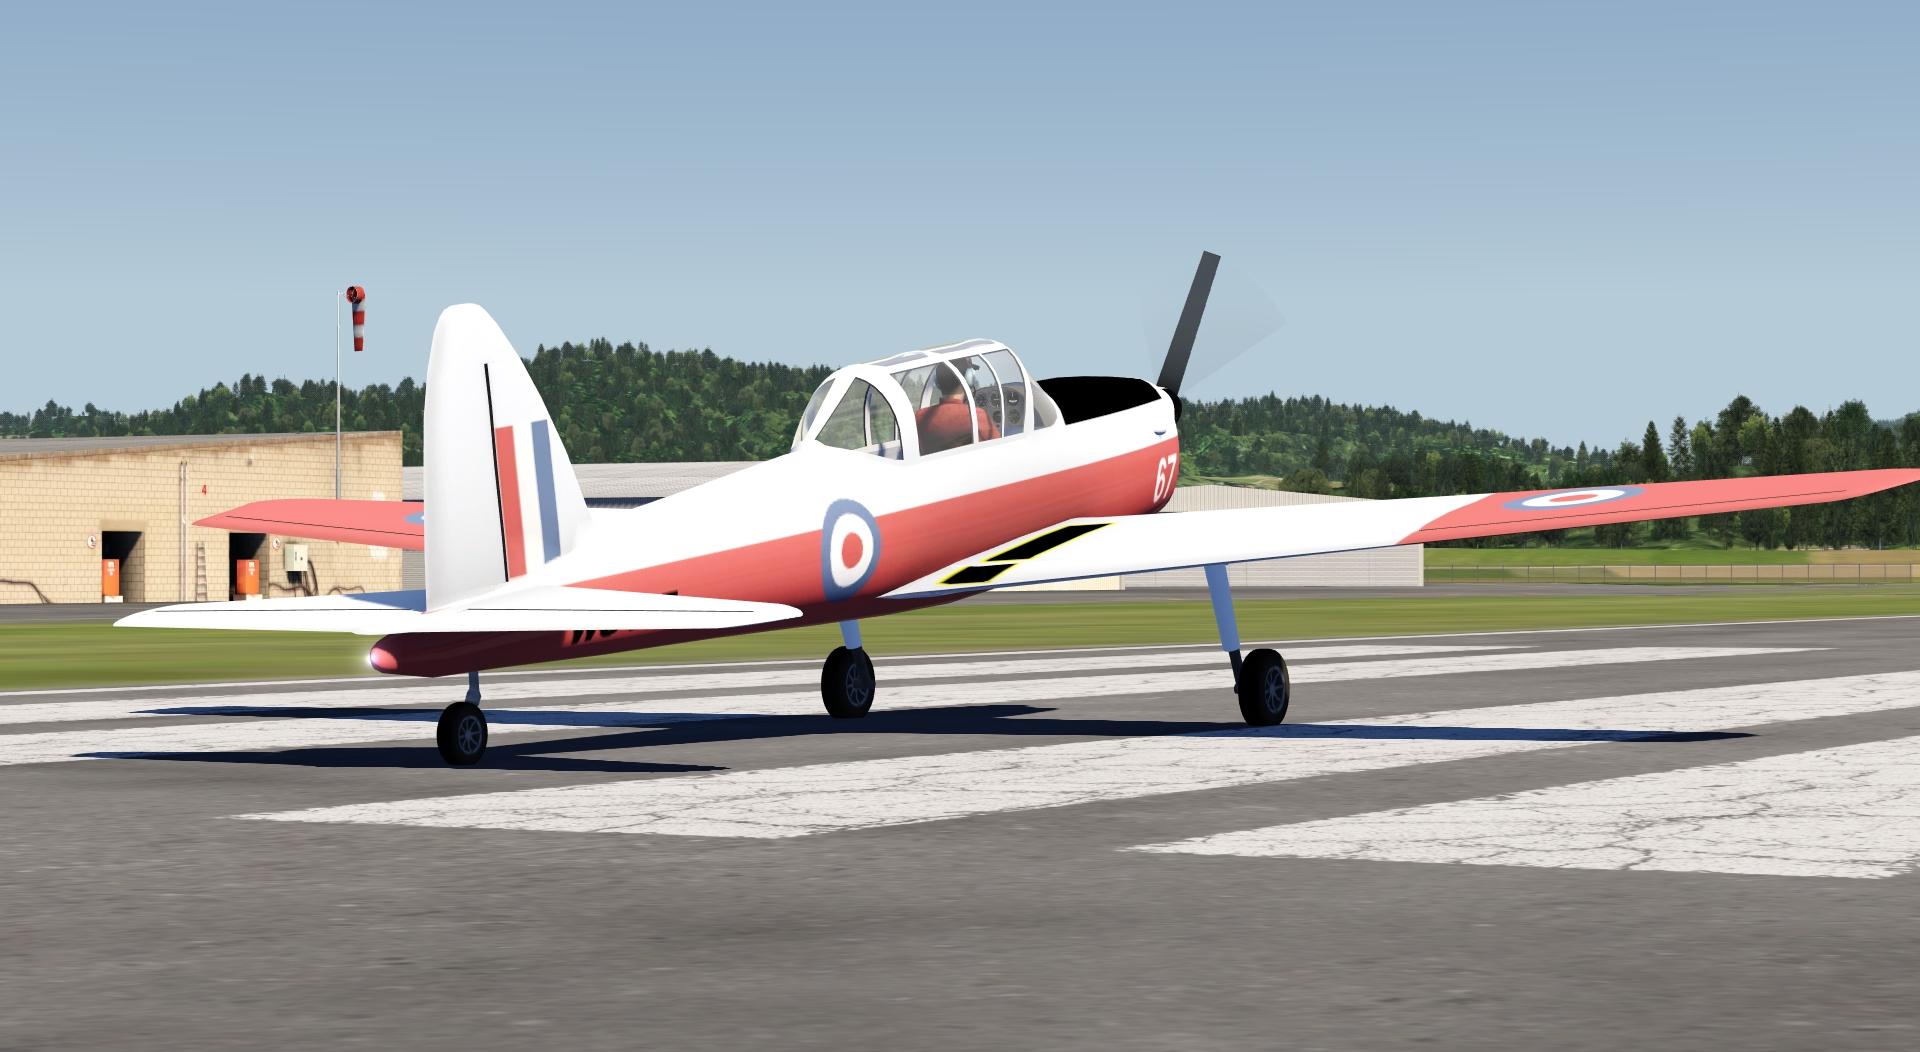 De Havilland DHC-1 Chipmunk – Aerofly FS Addon aircraft – Aerofly-Sim de